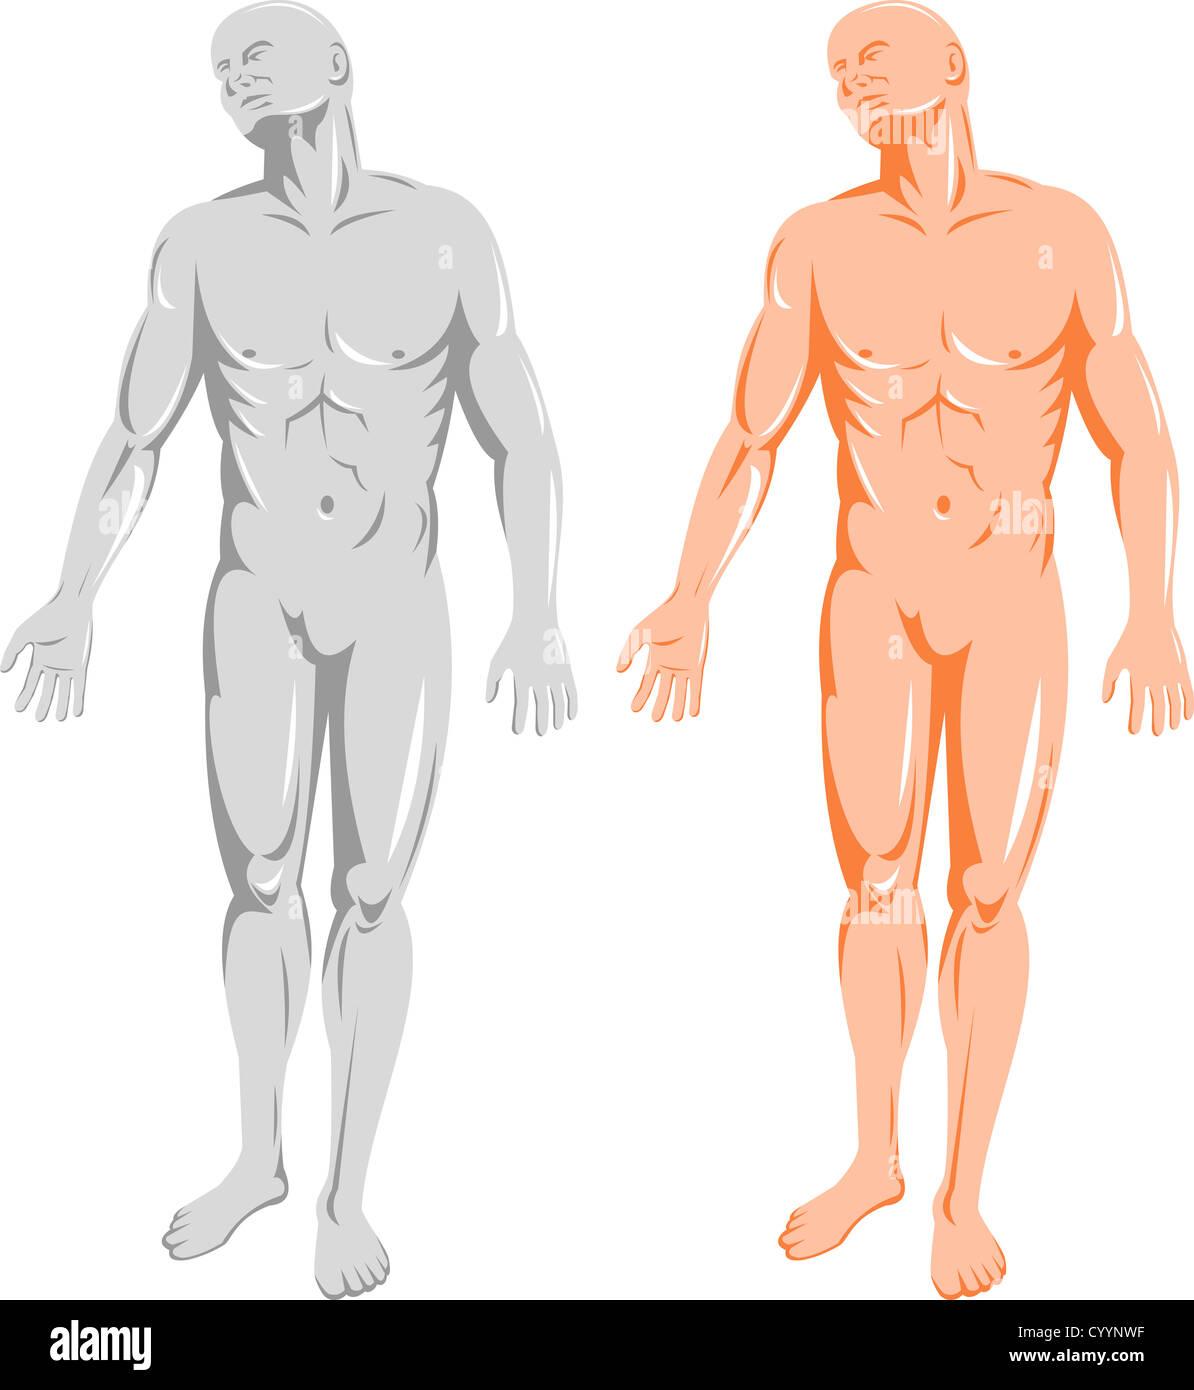 Anatomy Man Standing Illustration Stock Photos & Anatomy Man ...